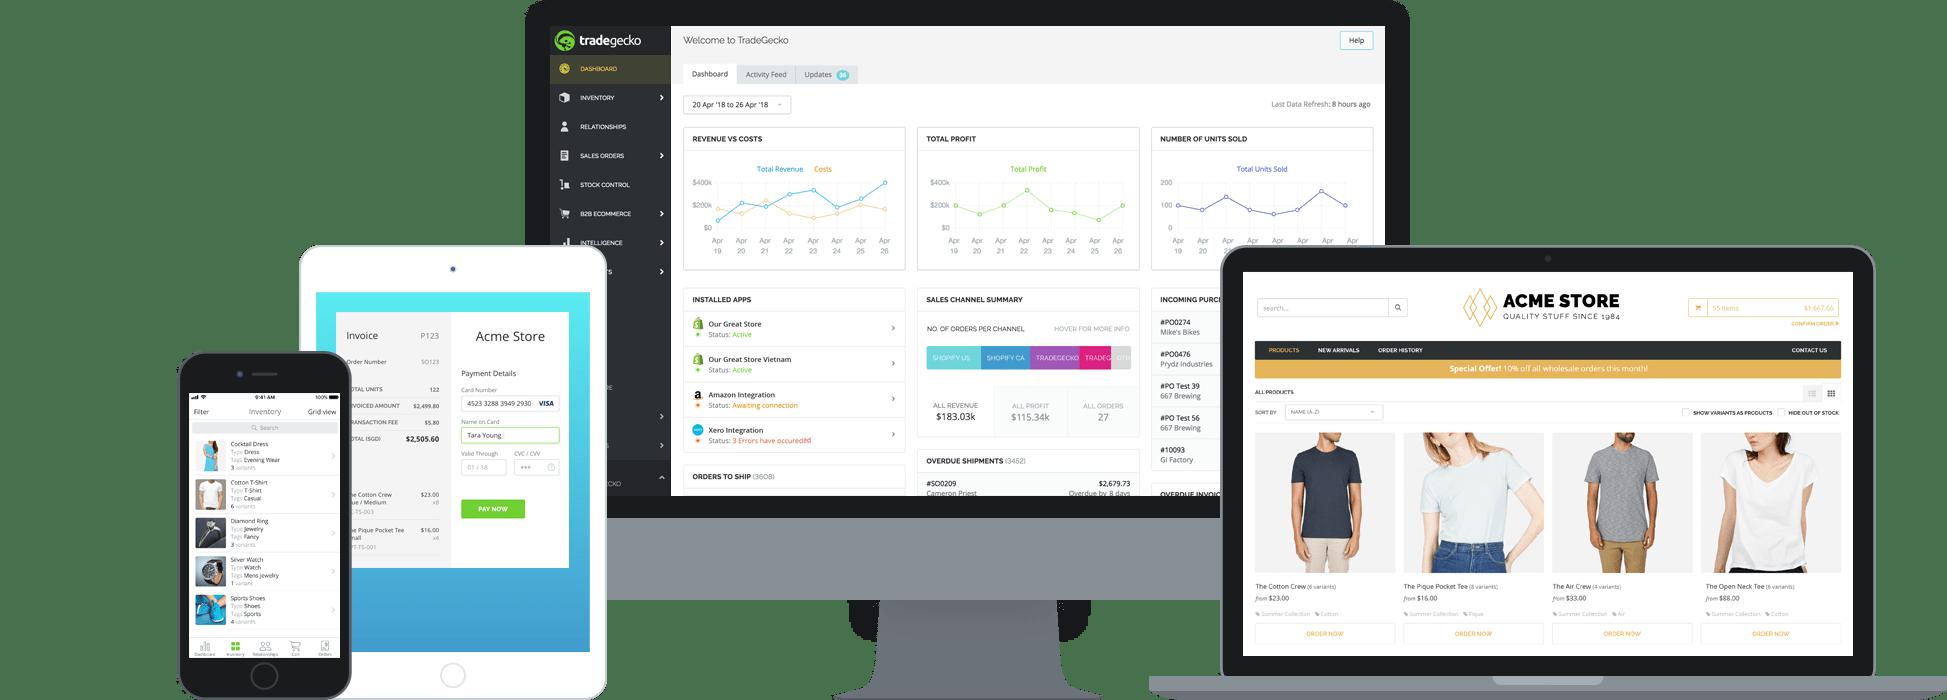 TradeGecko warehouse management software